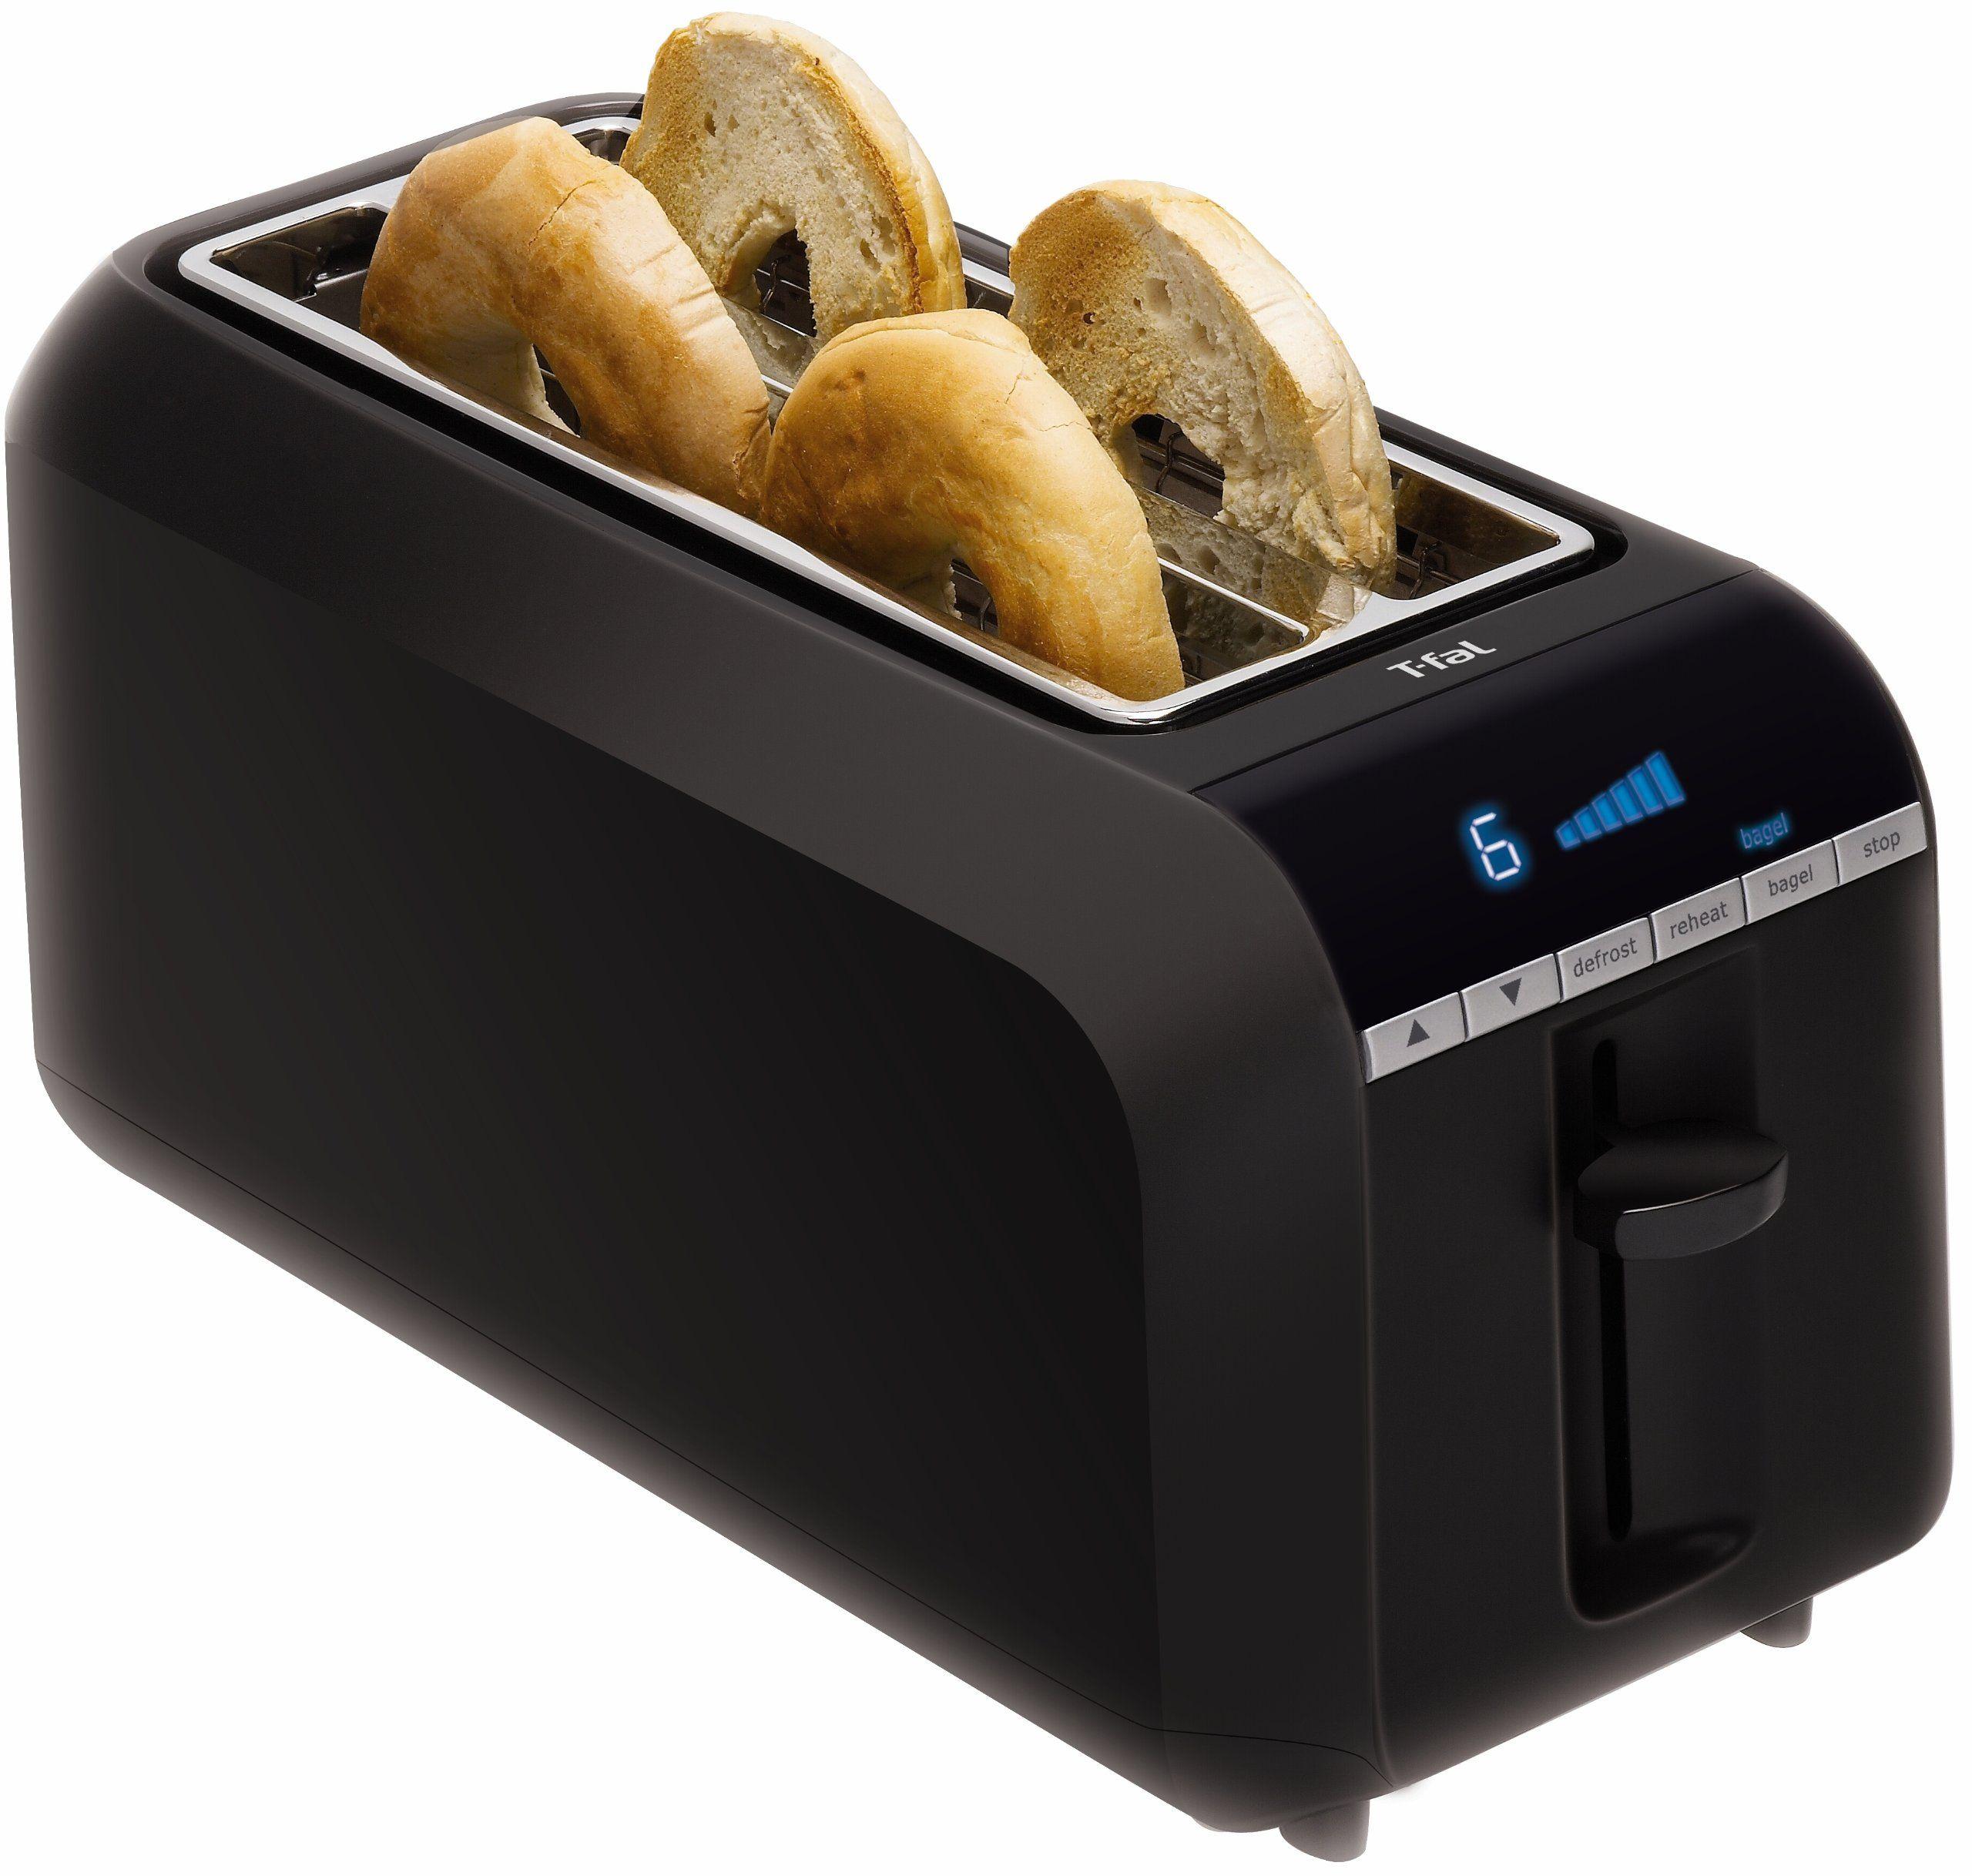 product stainless reviews steel toaster com walmart slice decker black